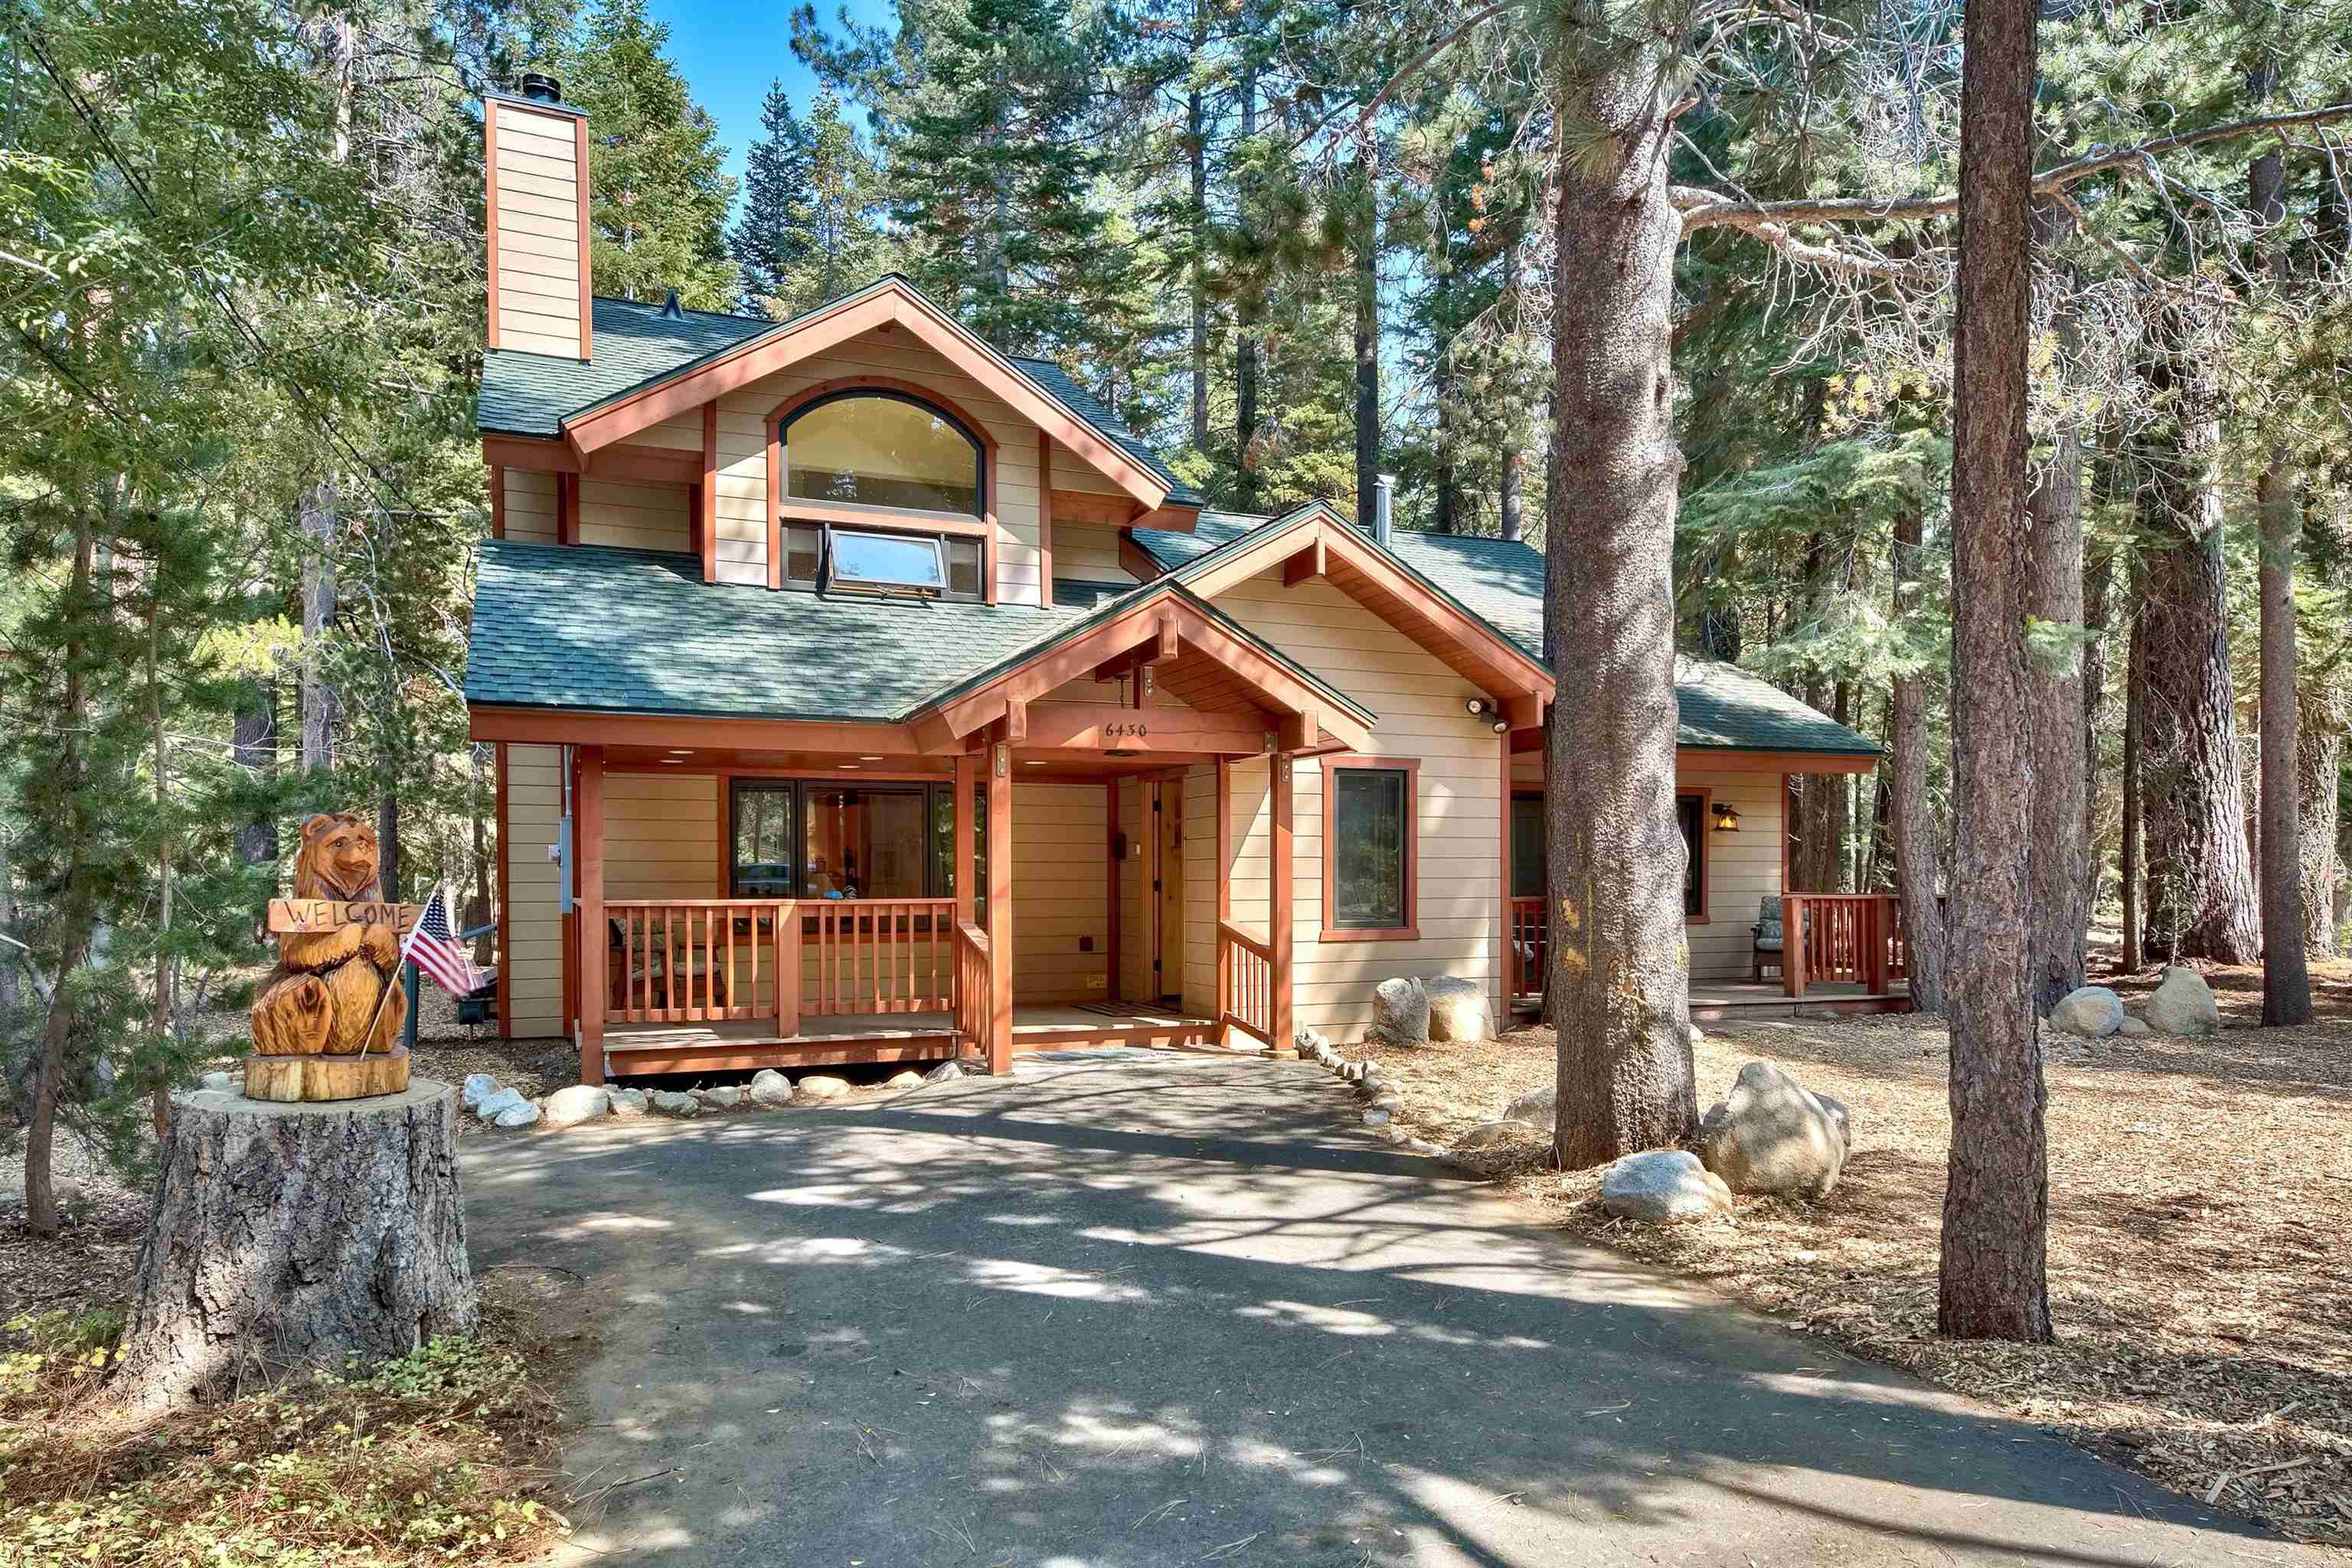 Image for 6430 Flicker Avenue, Homewood, CA 96140